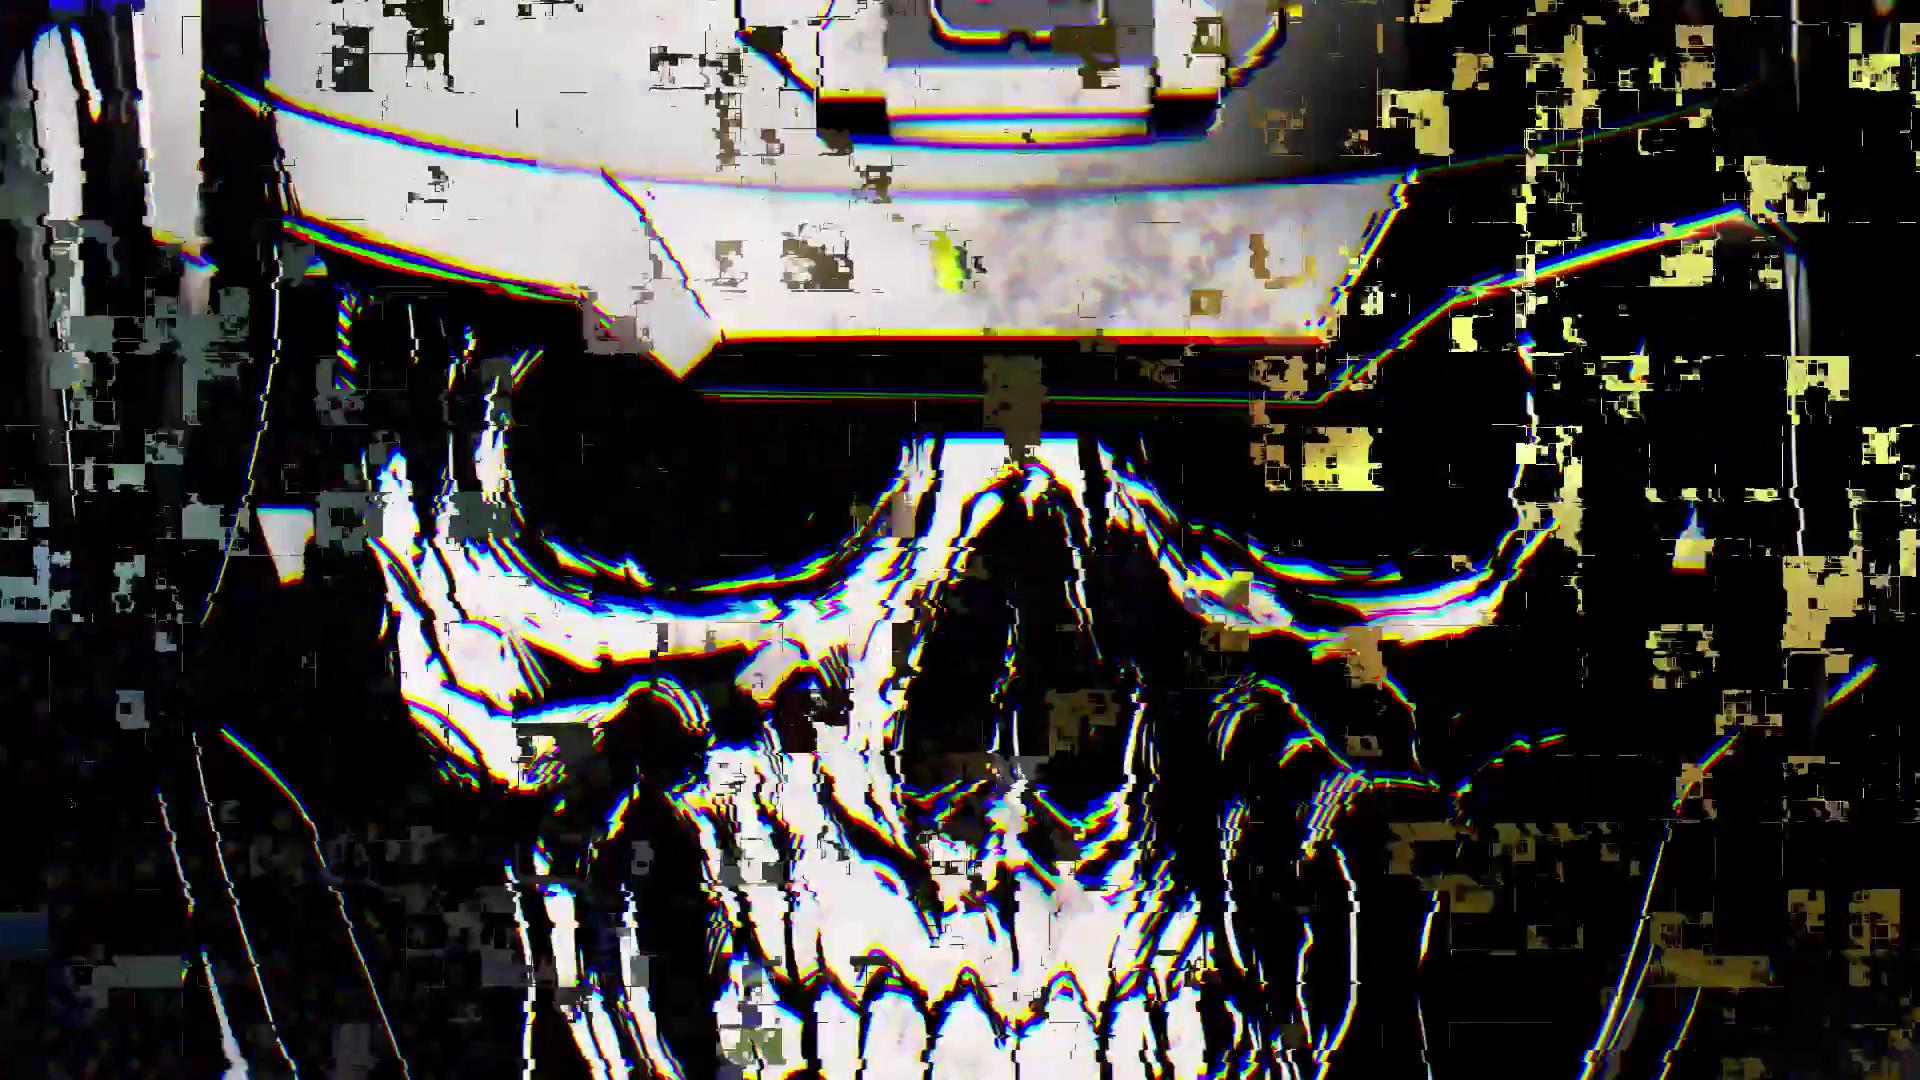 Call Of Duty Infinite Warfare Full HD Wallpaper And Background